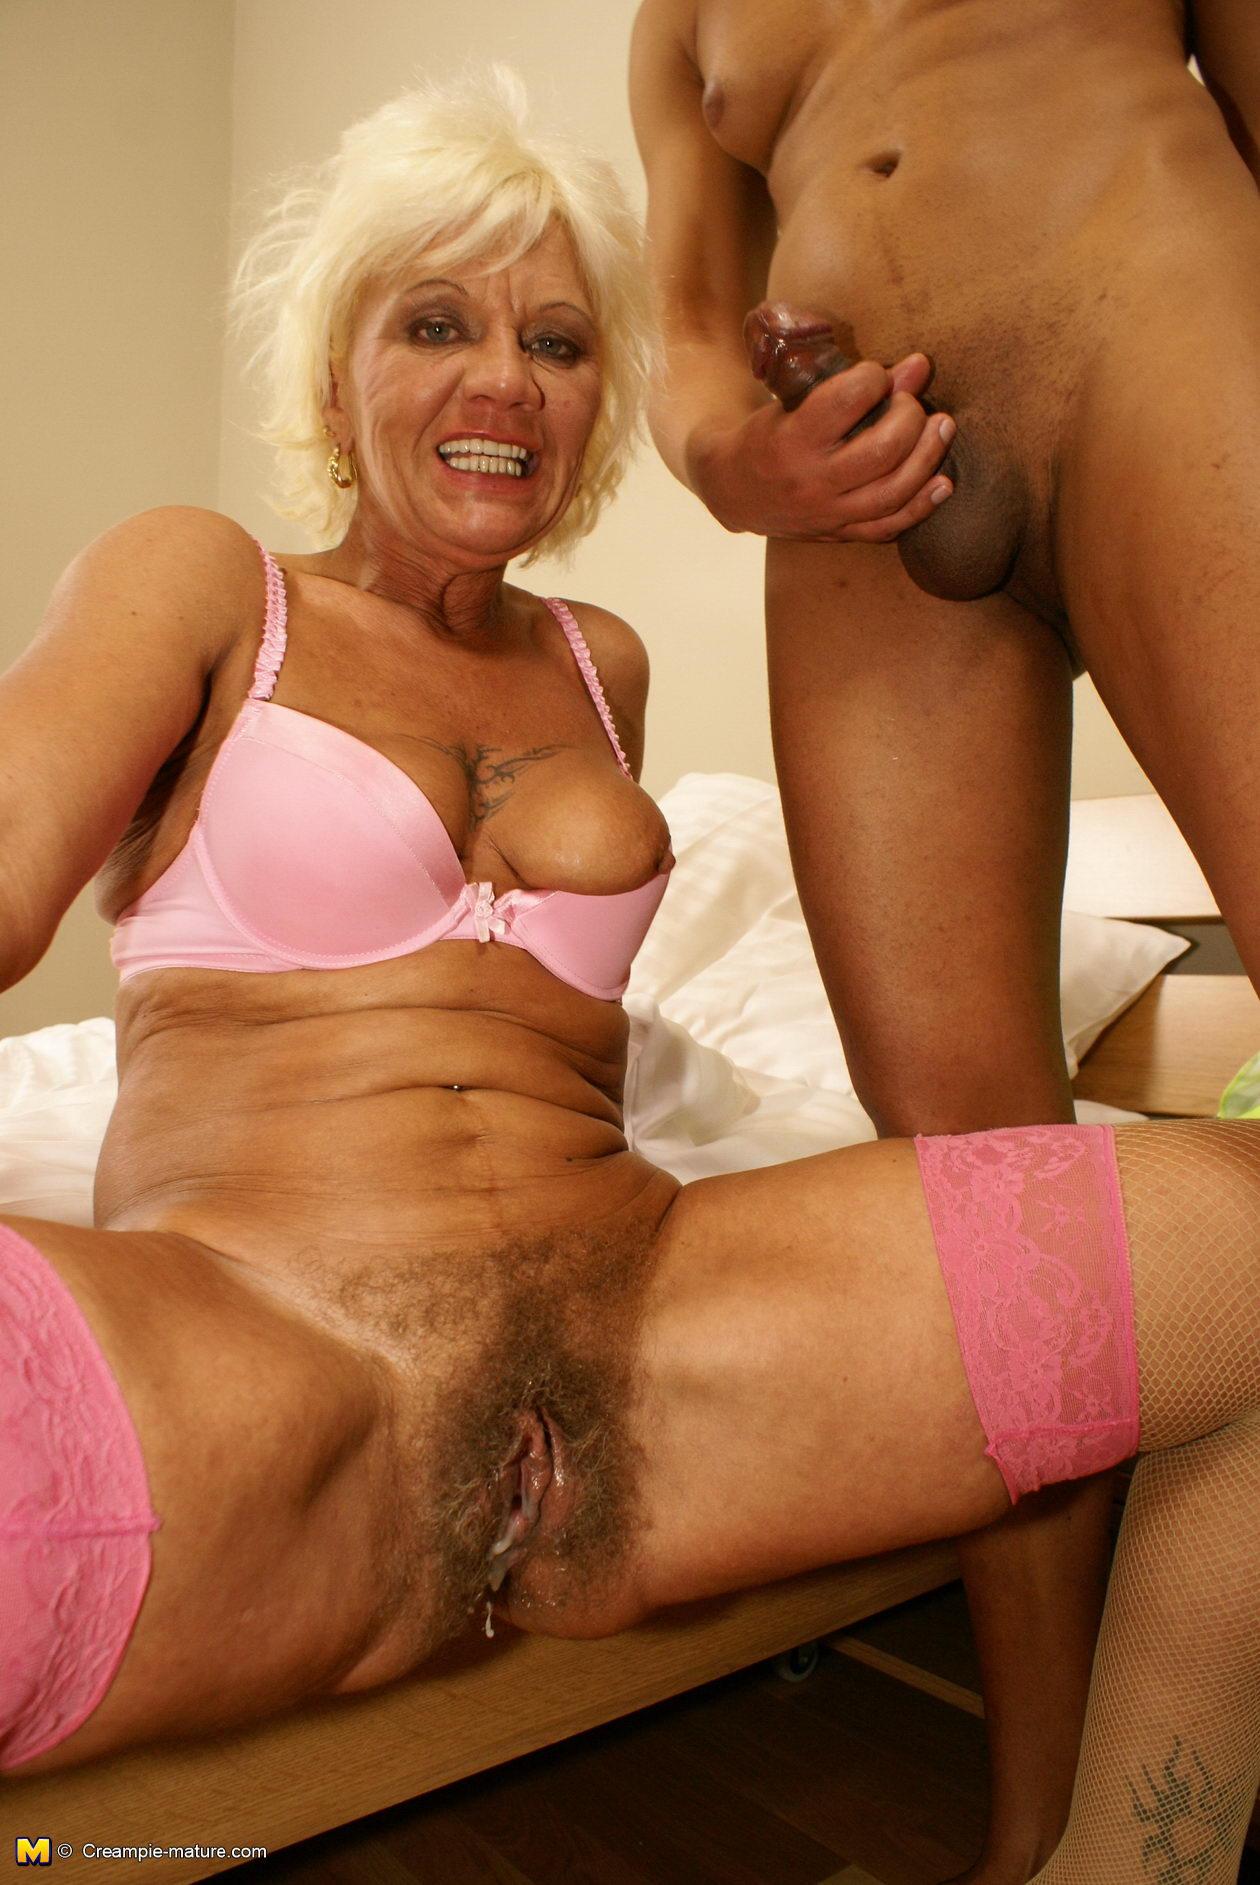 Greampie-mature Amature Porn Videos